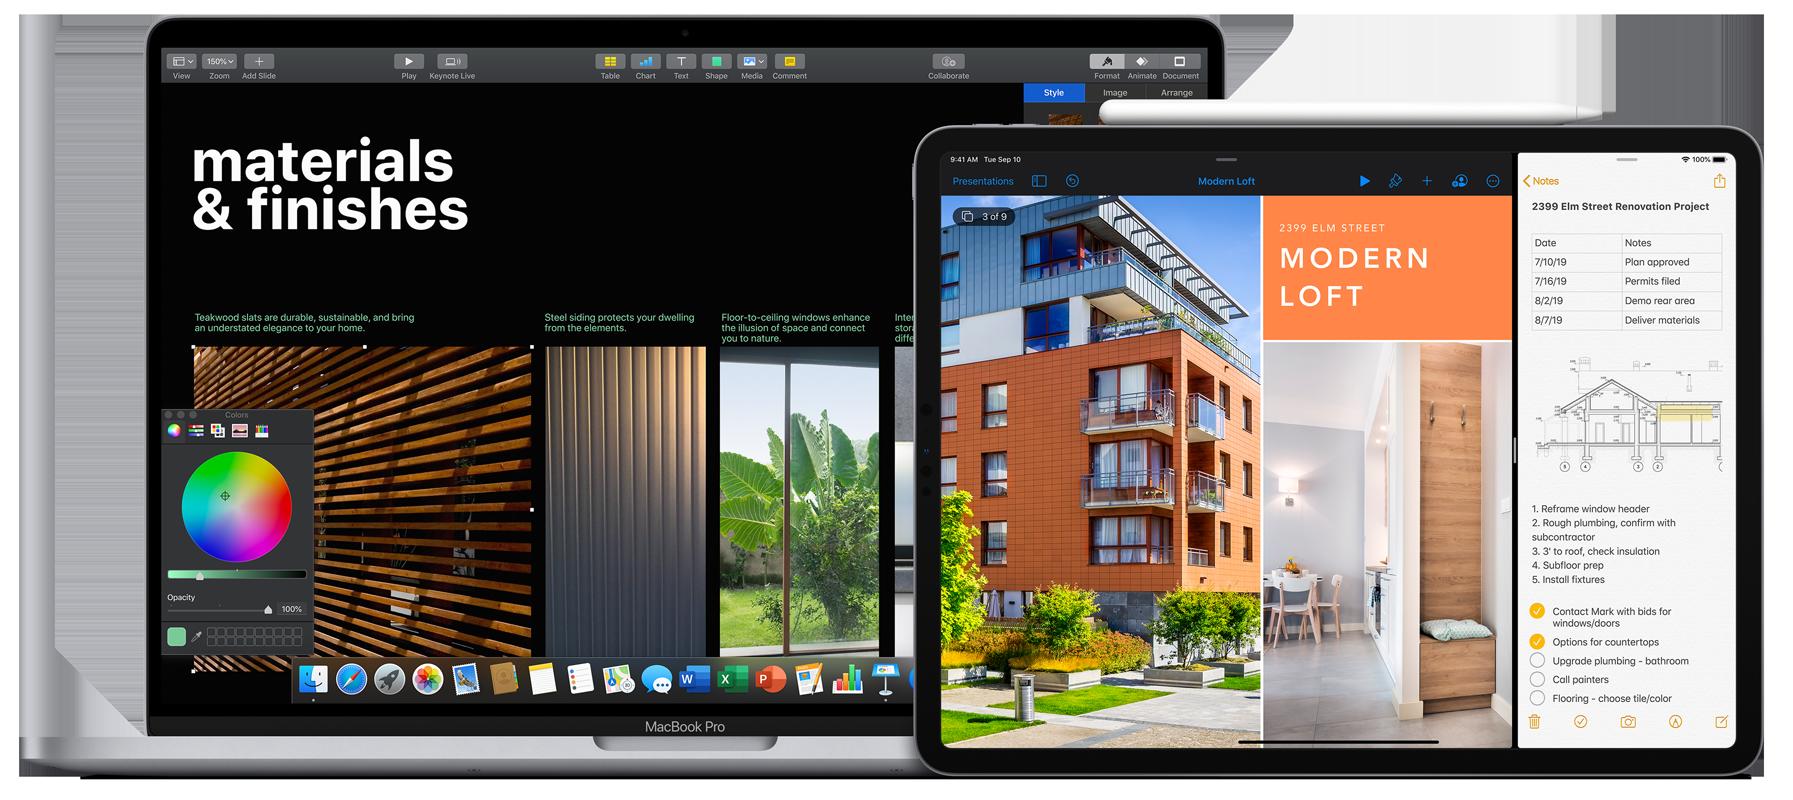 Business macbook pro 16 in ipad pro 12 9 in apple pencil us en screen